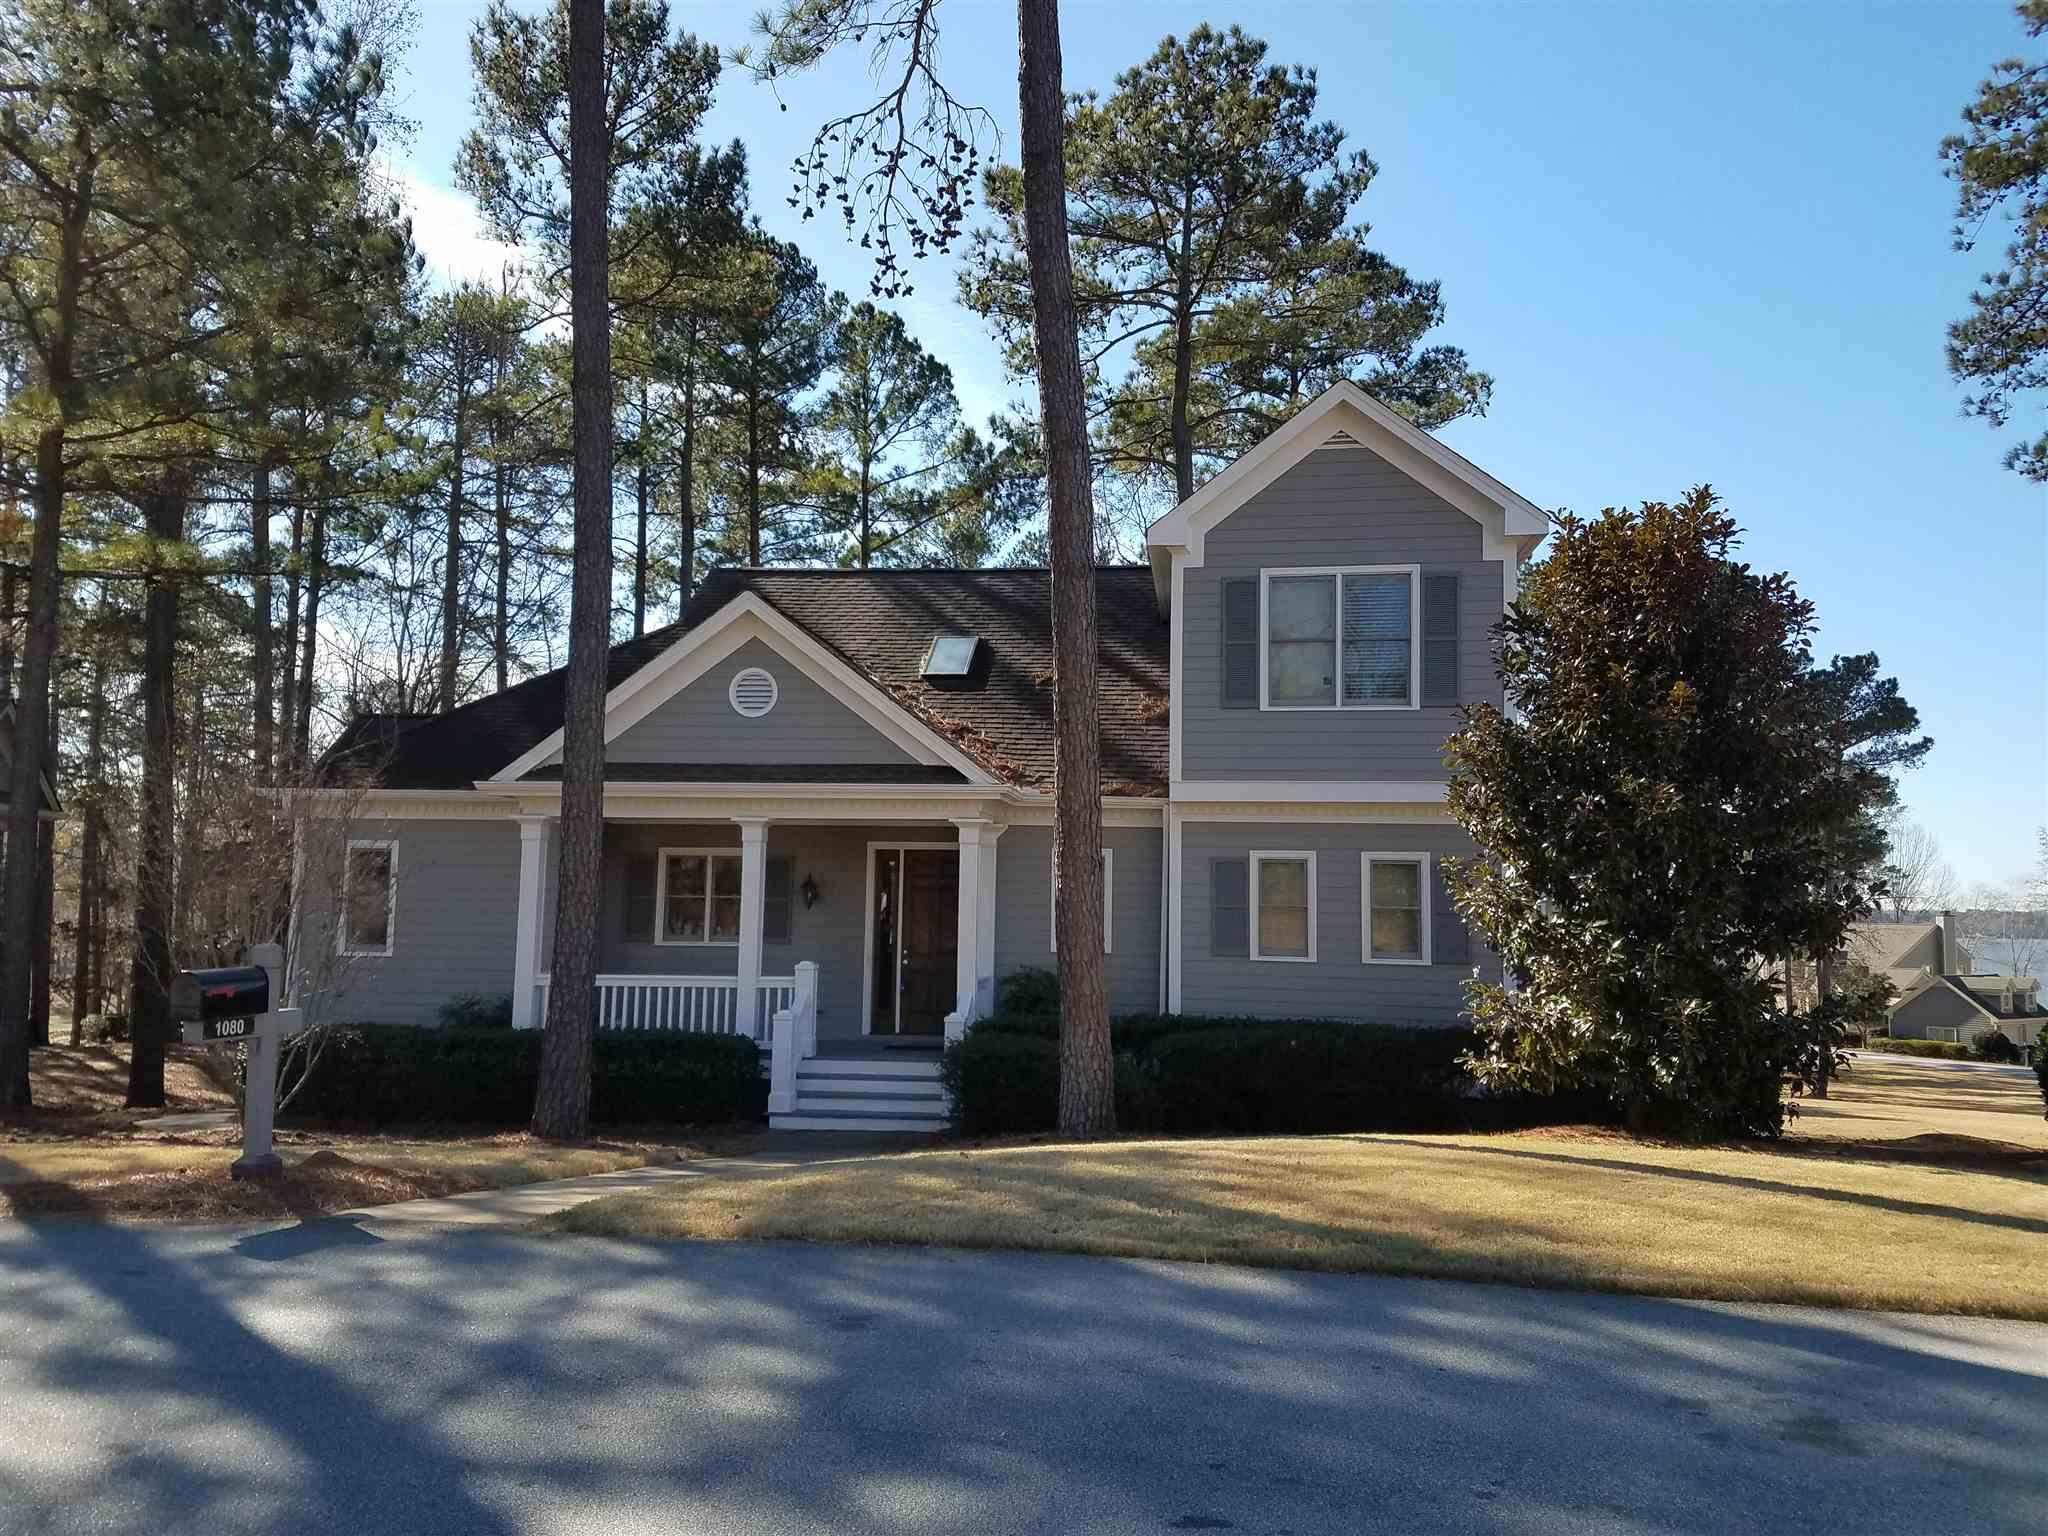 1080 EMERALD VIEW DRIVE, Lake Oconee Reynolds Landing in Greene County, GA 30642 Home for Sale